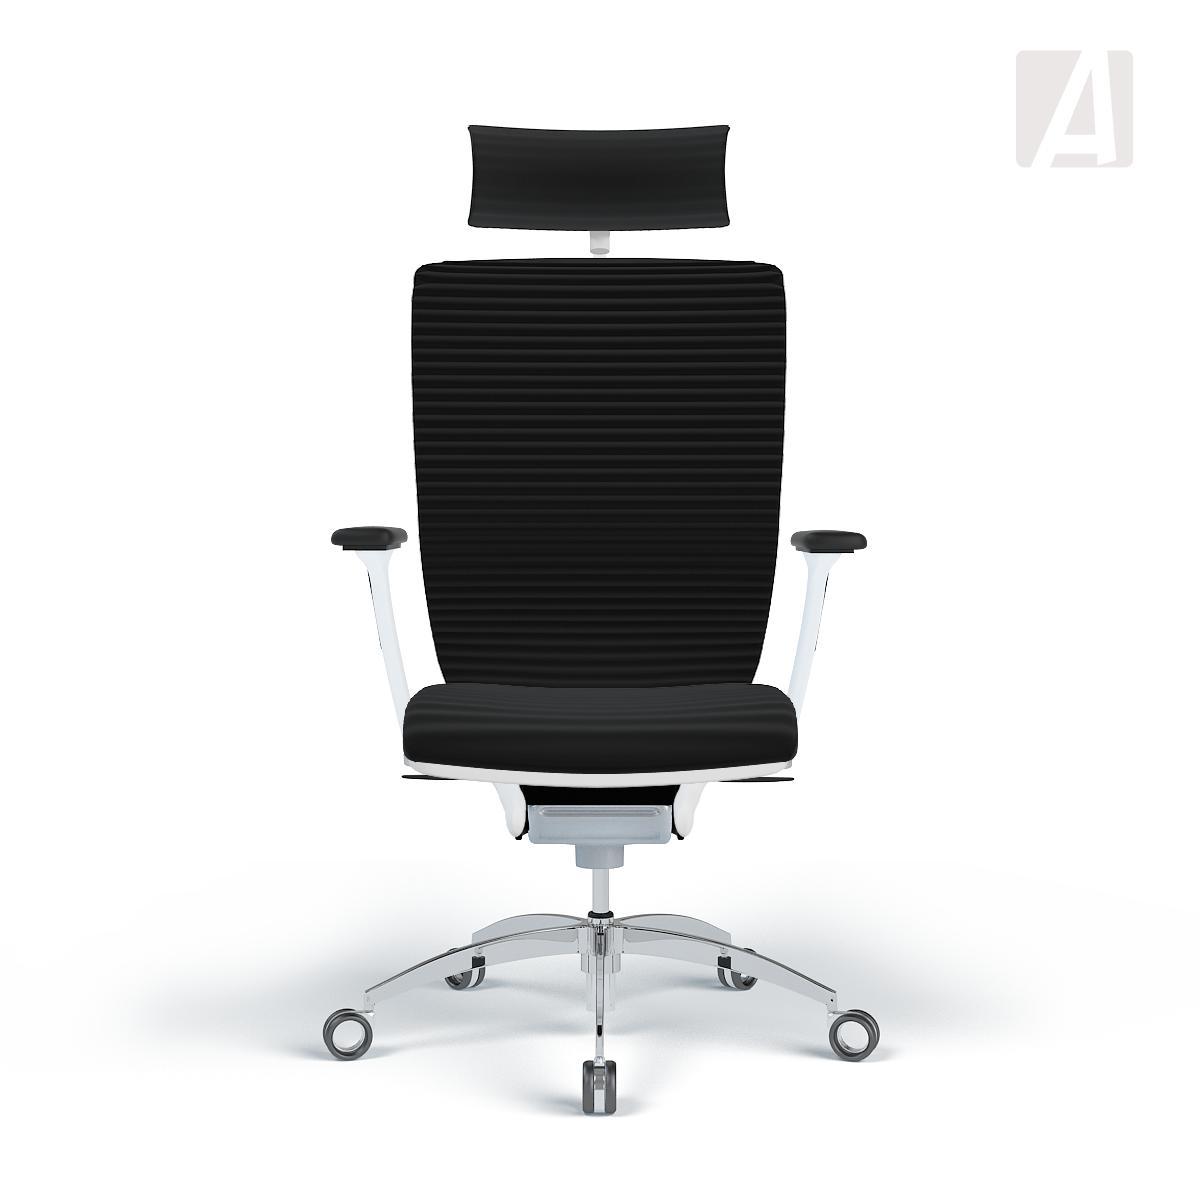 Bürostuhl weiß stoff  WAGNER Bürostuhl Titan 20 - 3D-Stoff Schwarz - Gestell Weiß ...